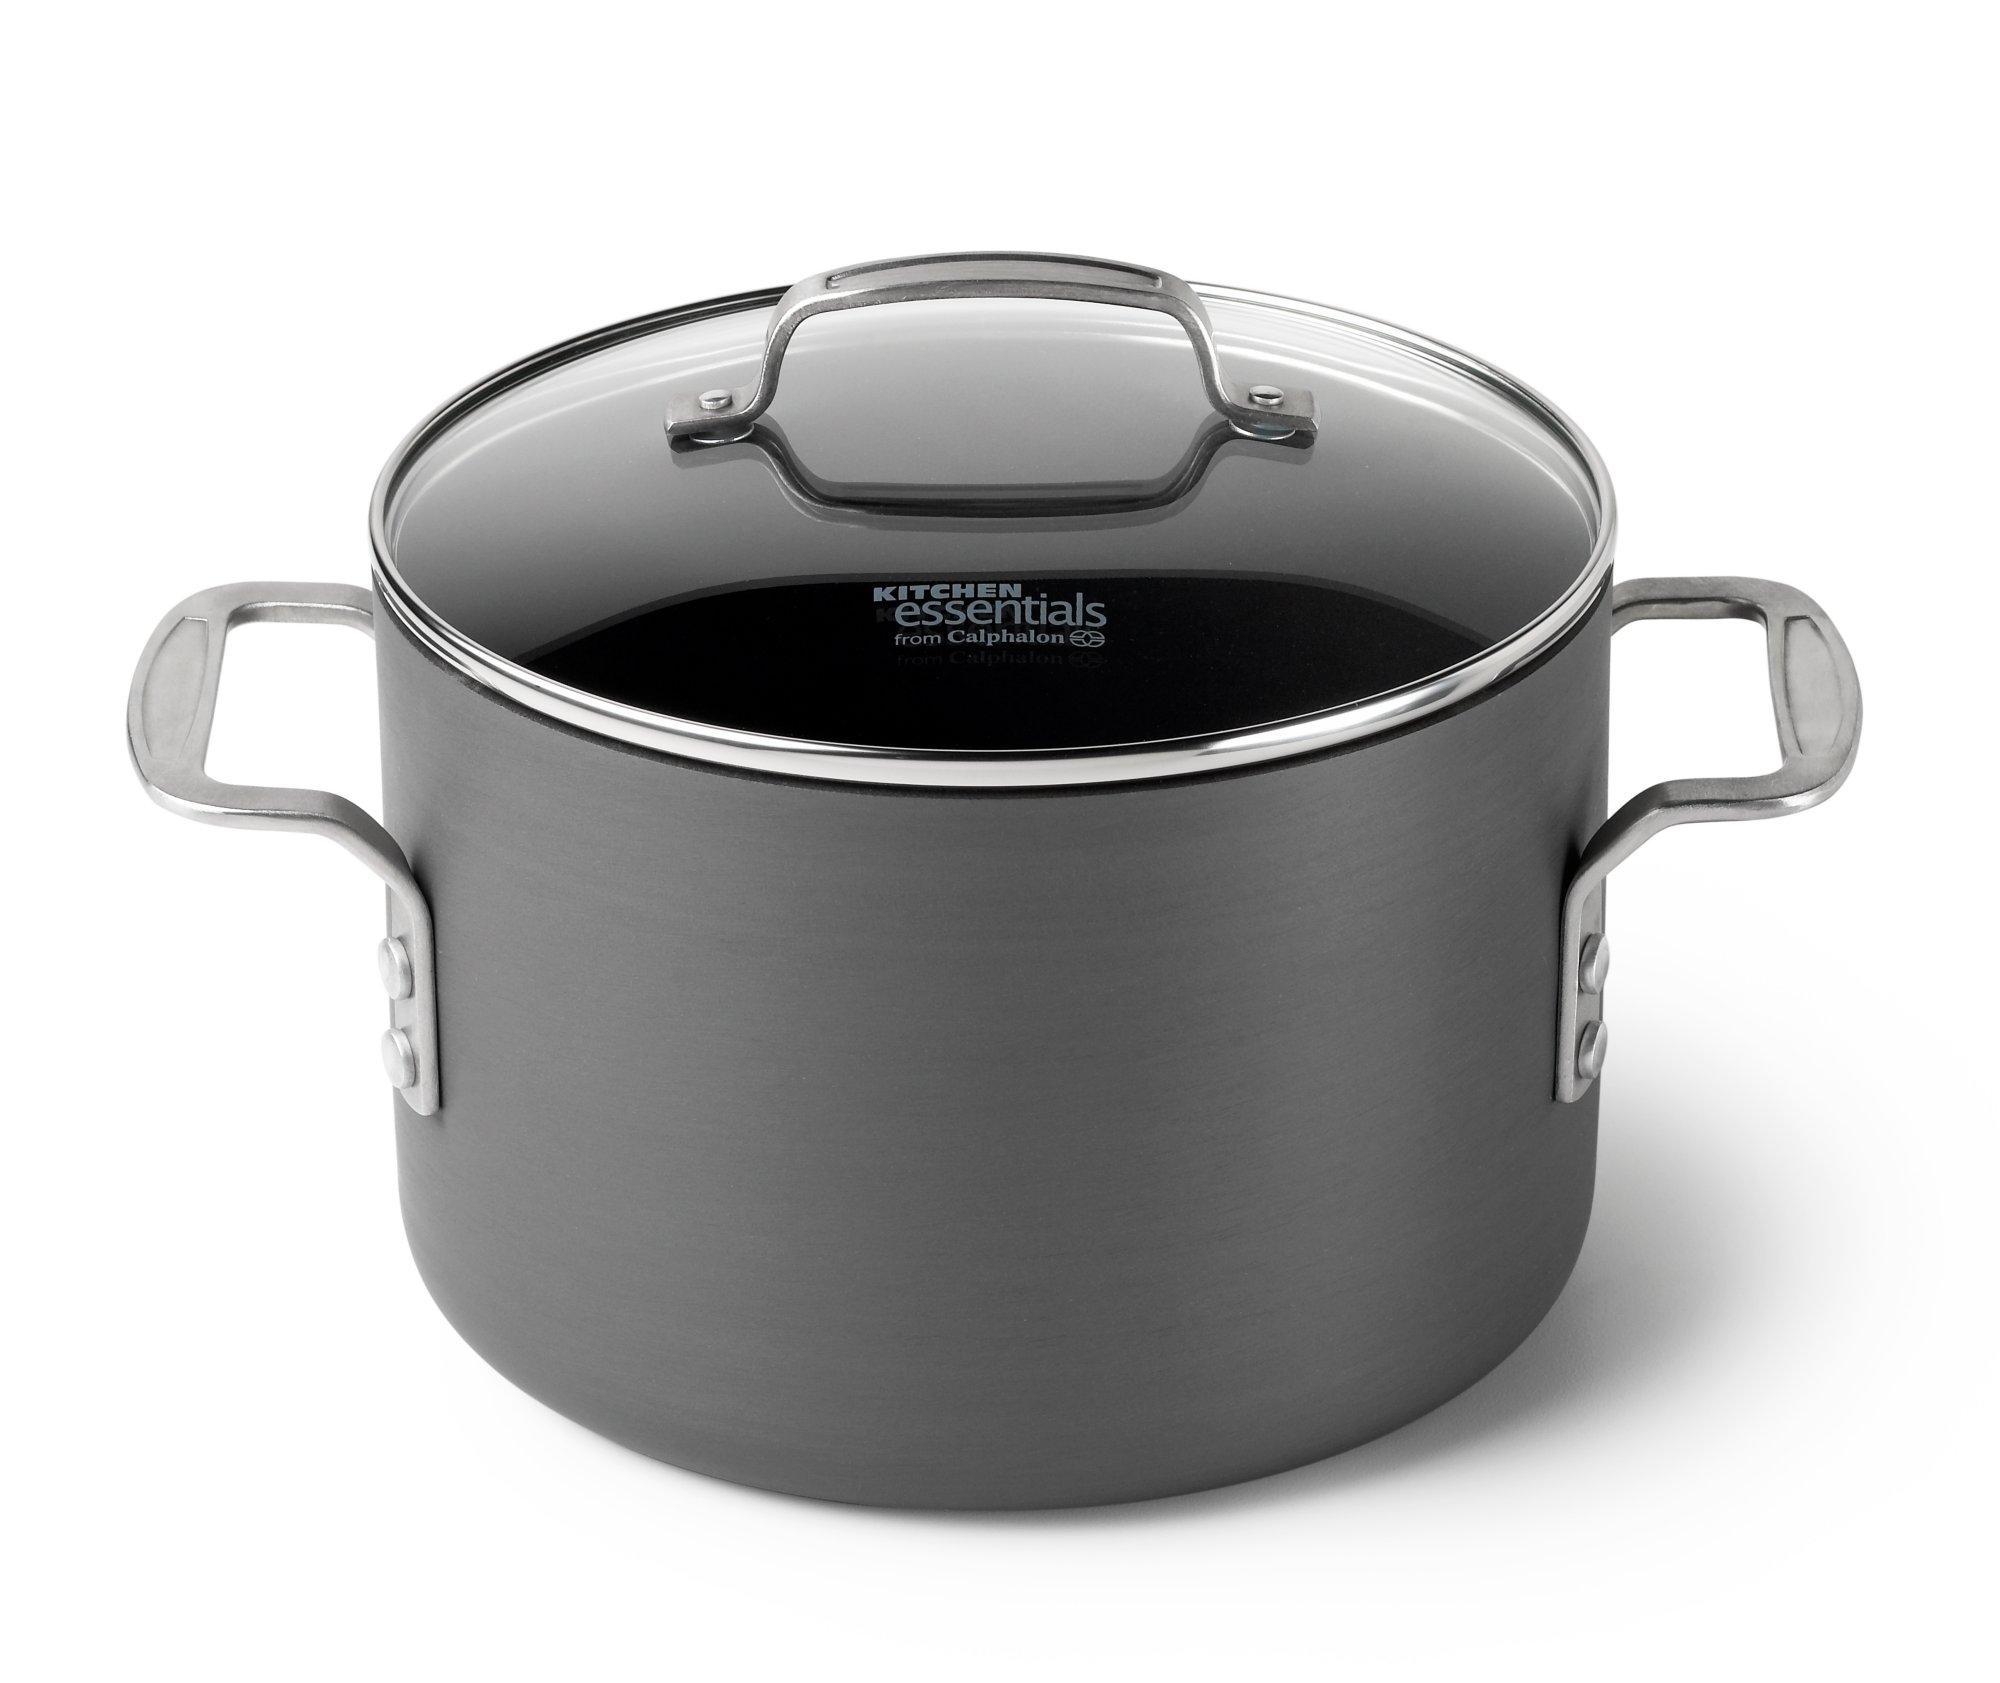 Calphalon Kitchen Essentials Nonstick 8-qt. Pasta Pot ...